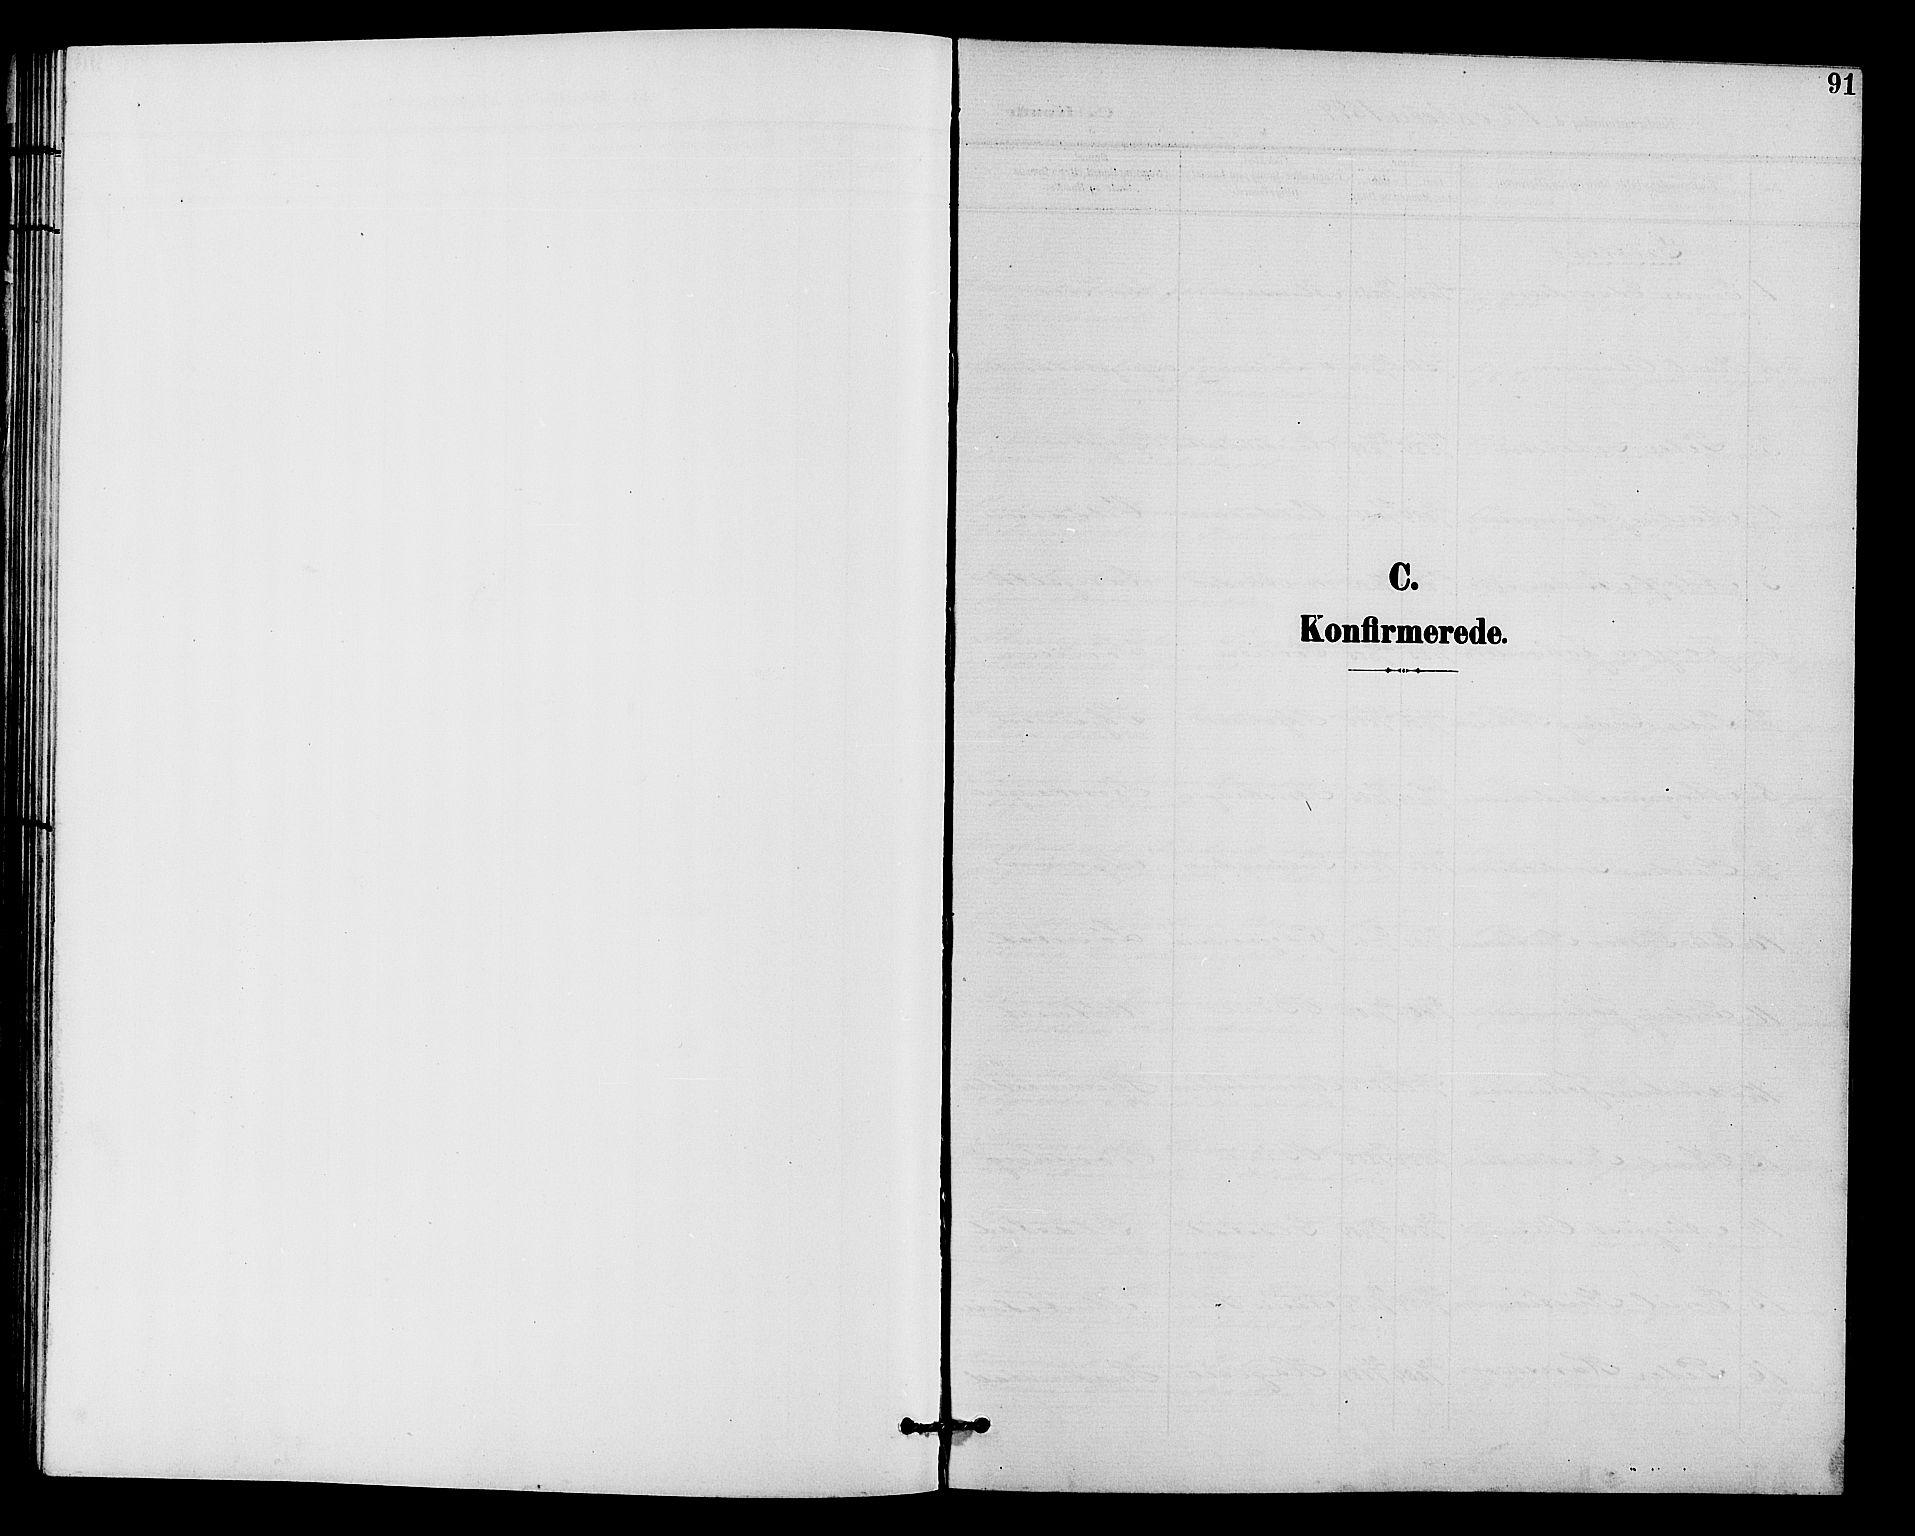 SAH, Vardal prestekontor, H/Ha/Hab/L0011: Klokkerbok nr. 11, 1899-1913, s. 91